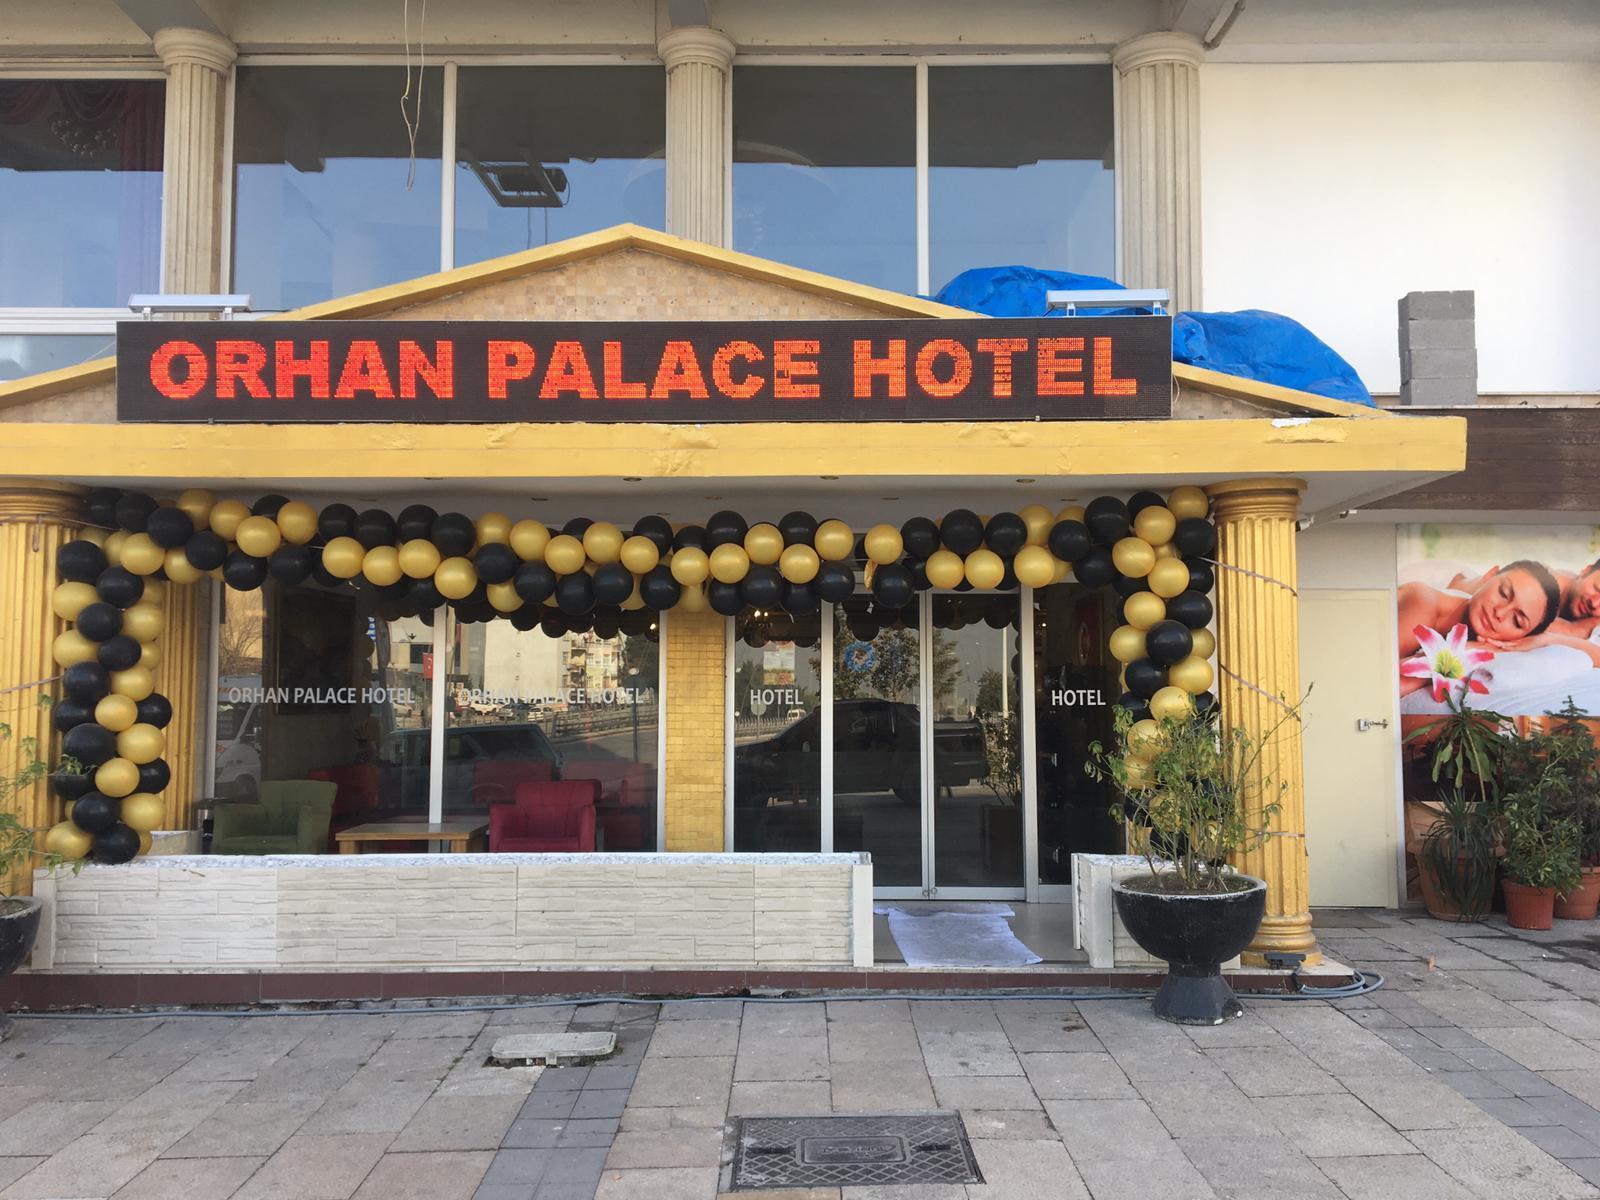 ORHAN PALACE HOTEL